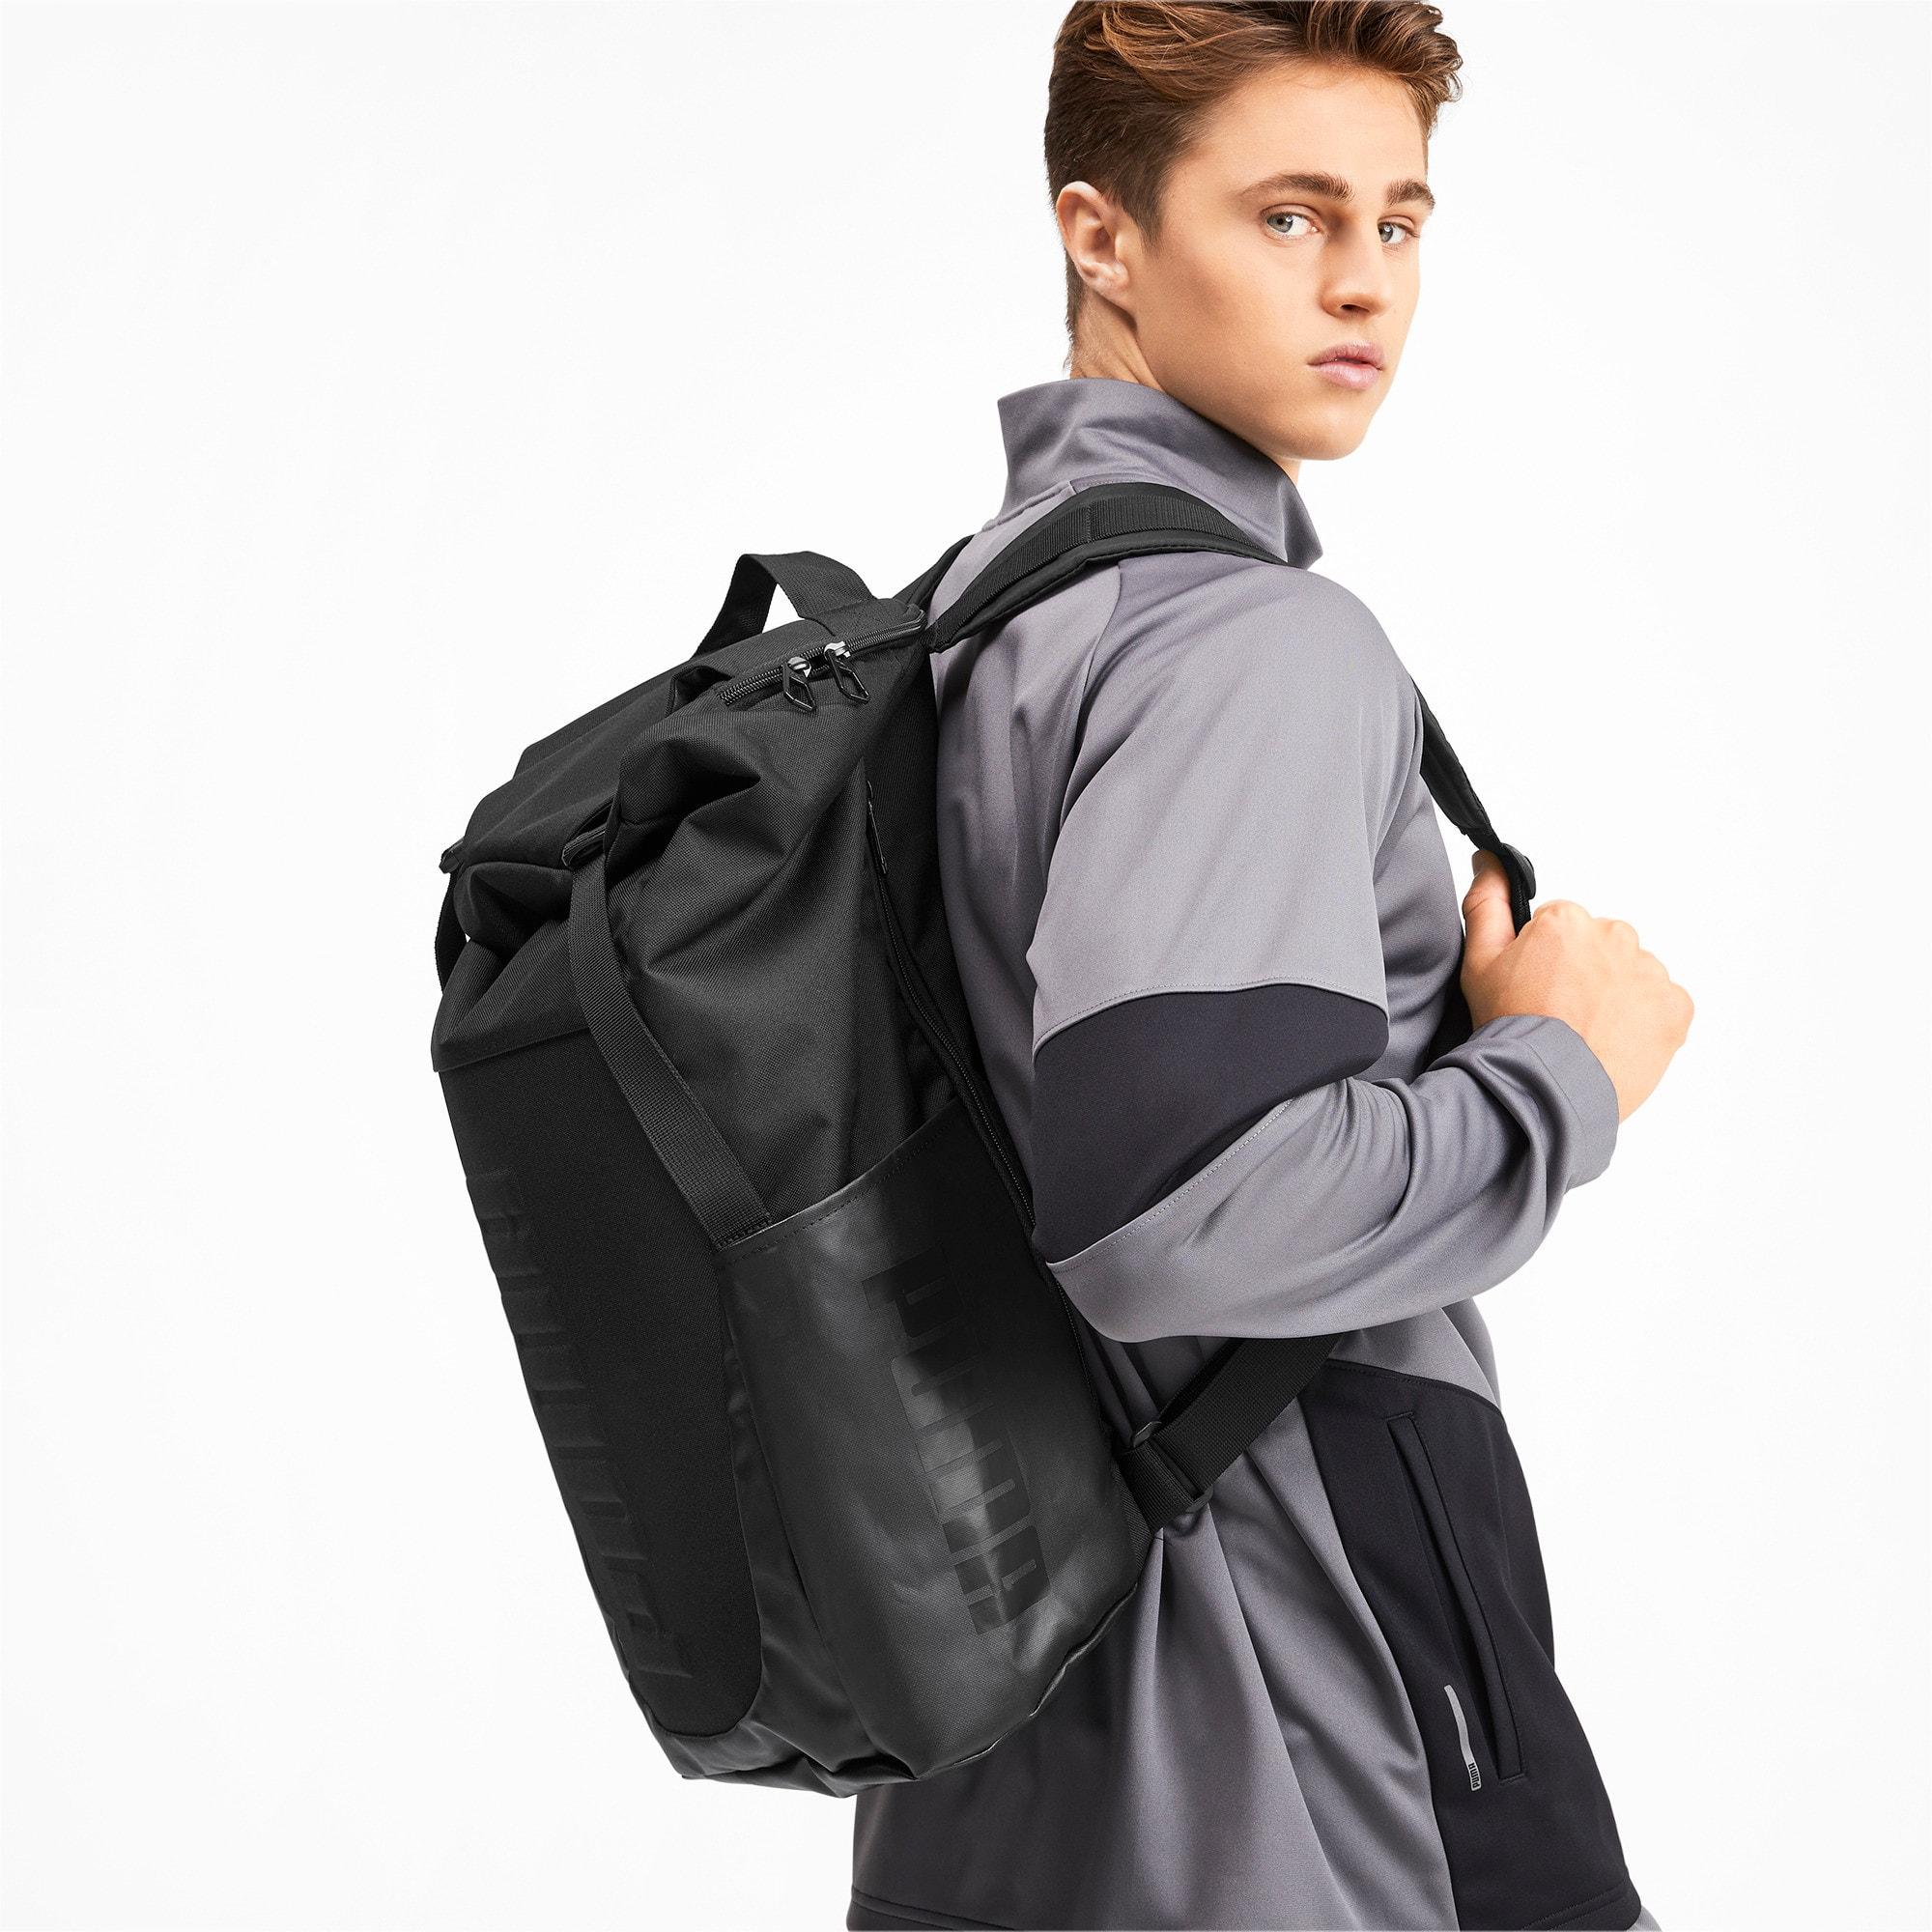 Thumbnail 2 of Training Transform Duffle Bag, Puma Black, medium-IND